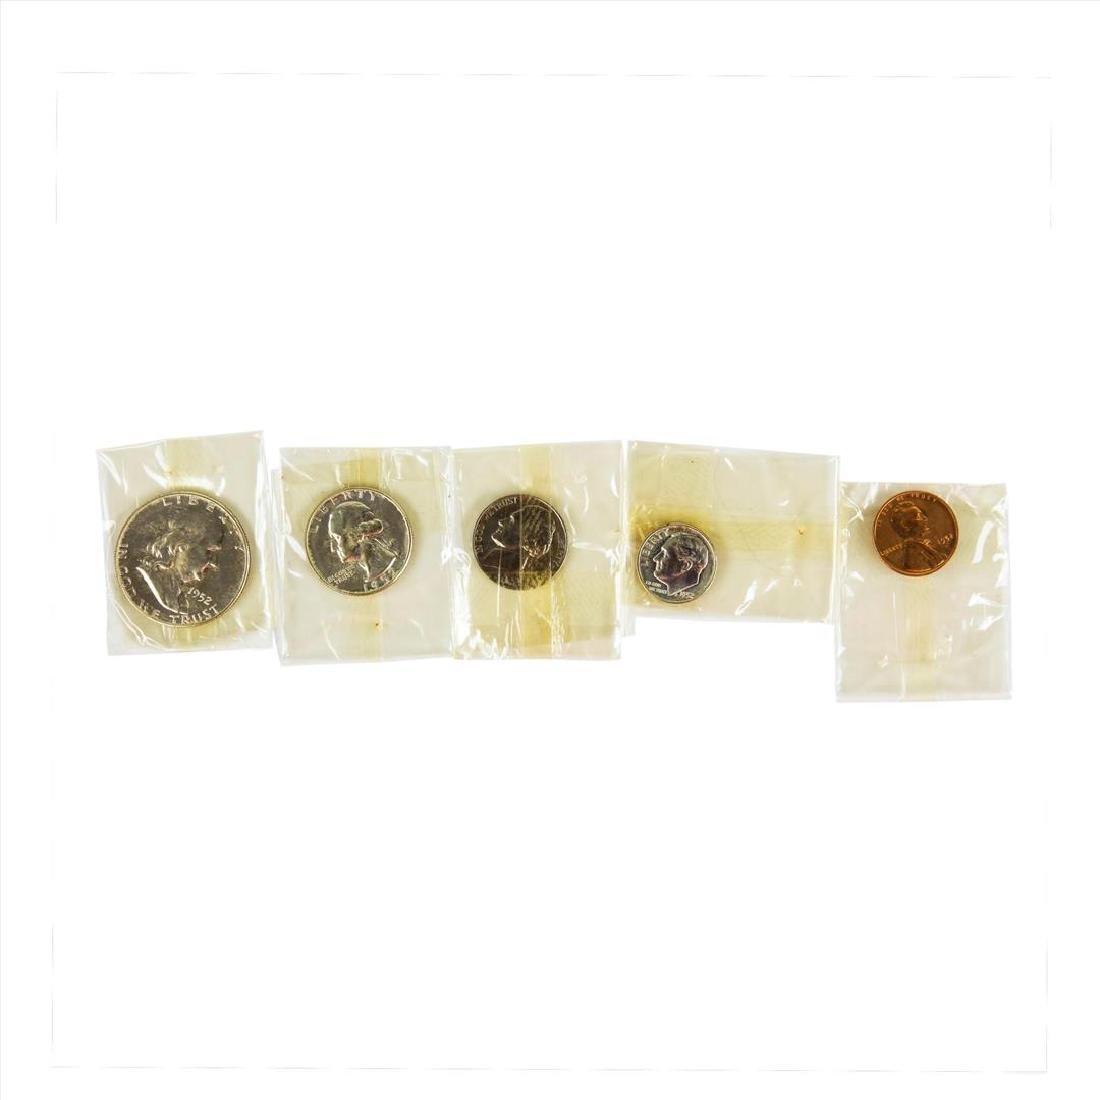 1952 (5) Coin Proof Set in Original Box